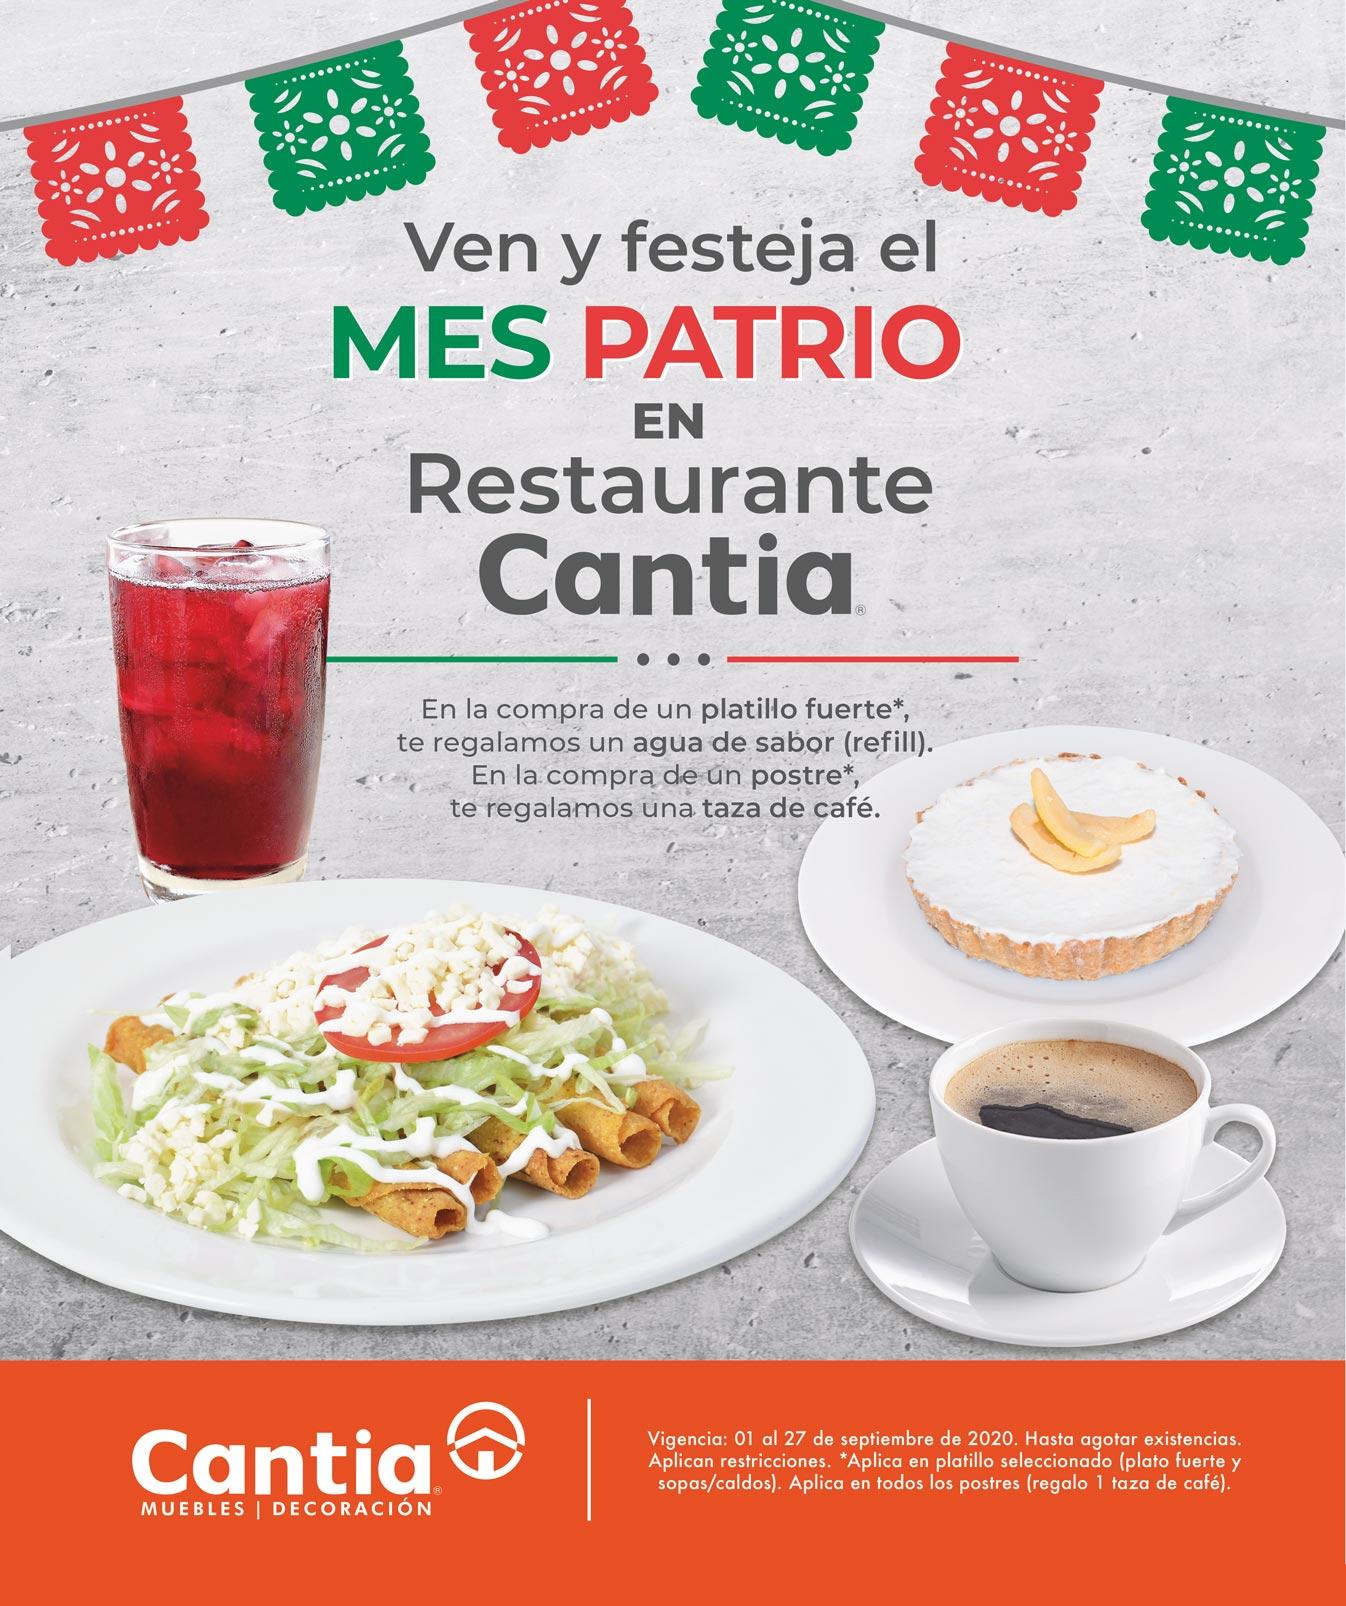 CANTIA